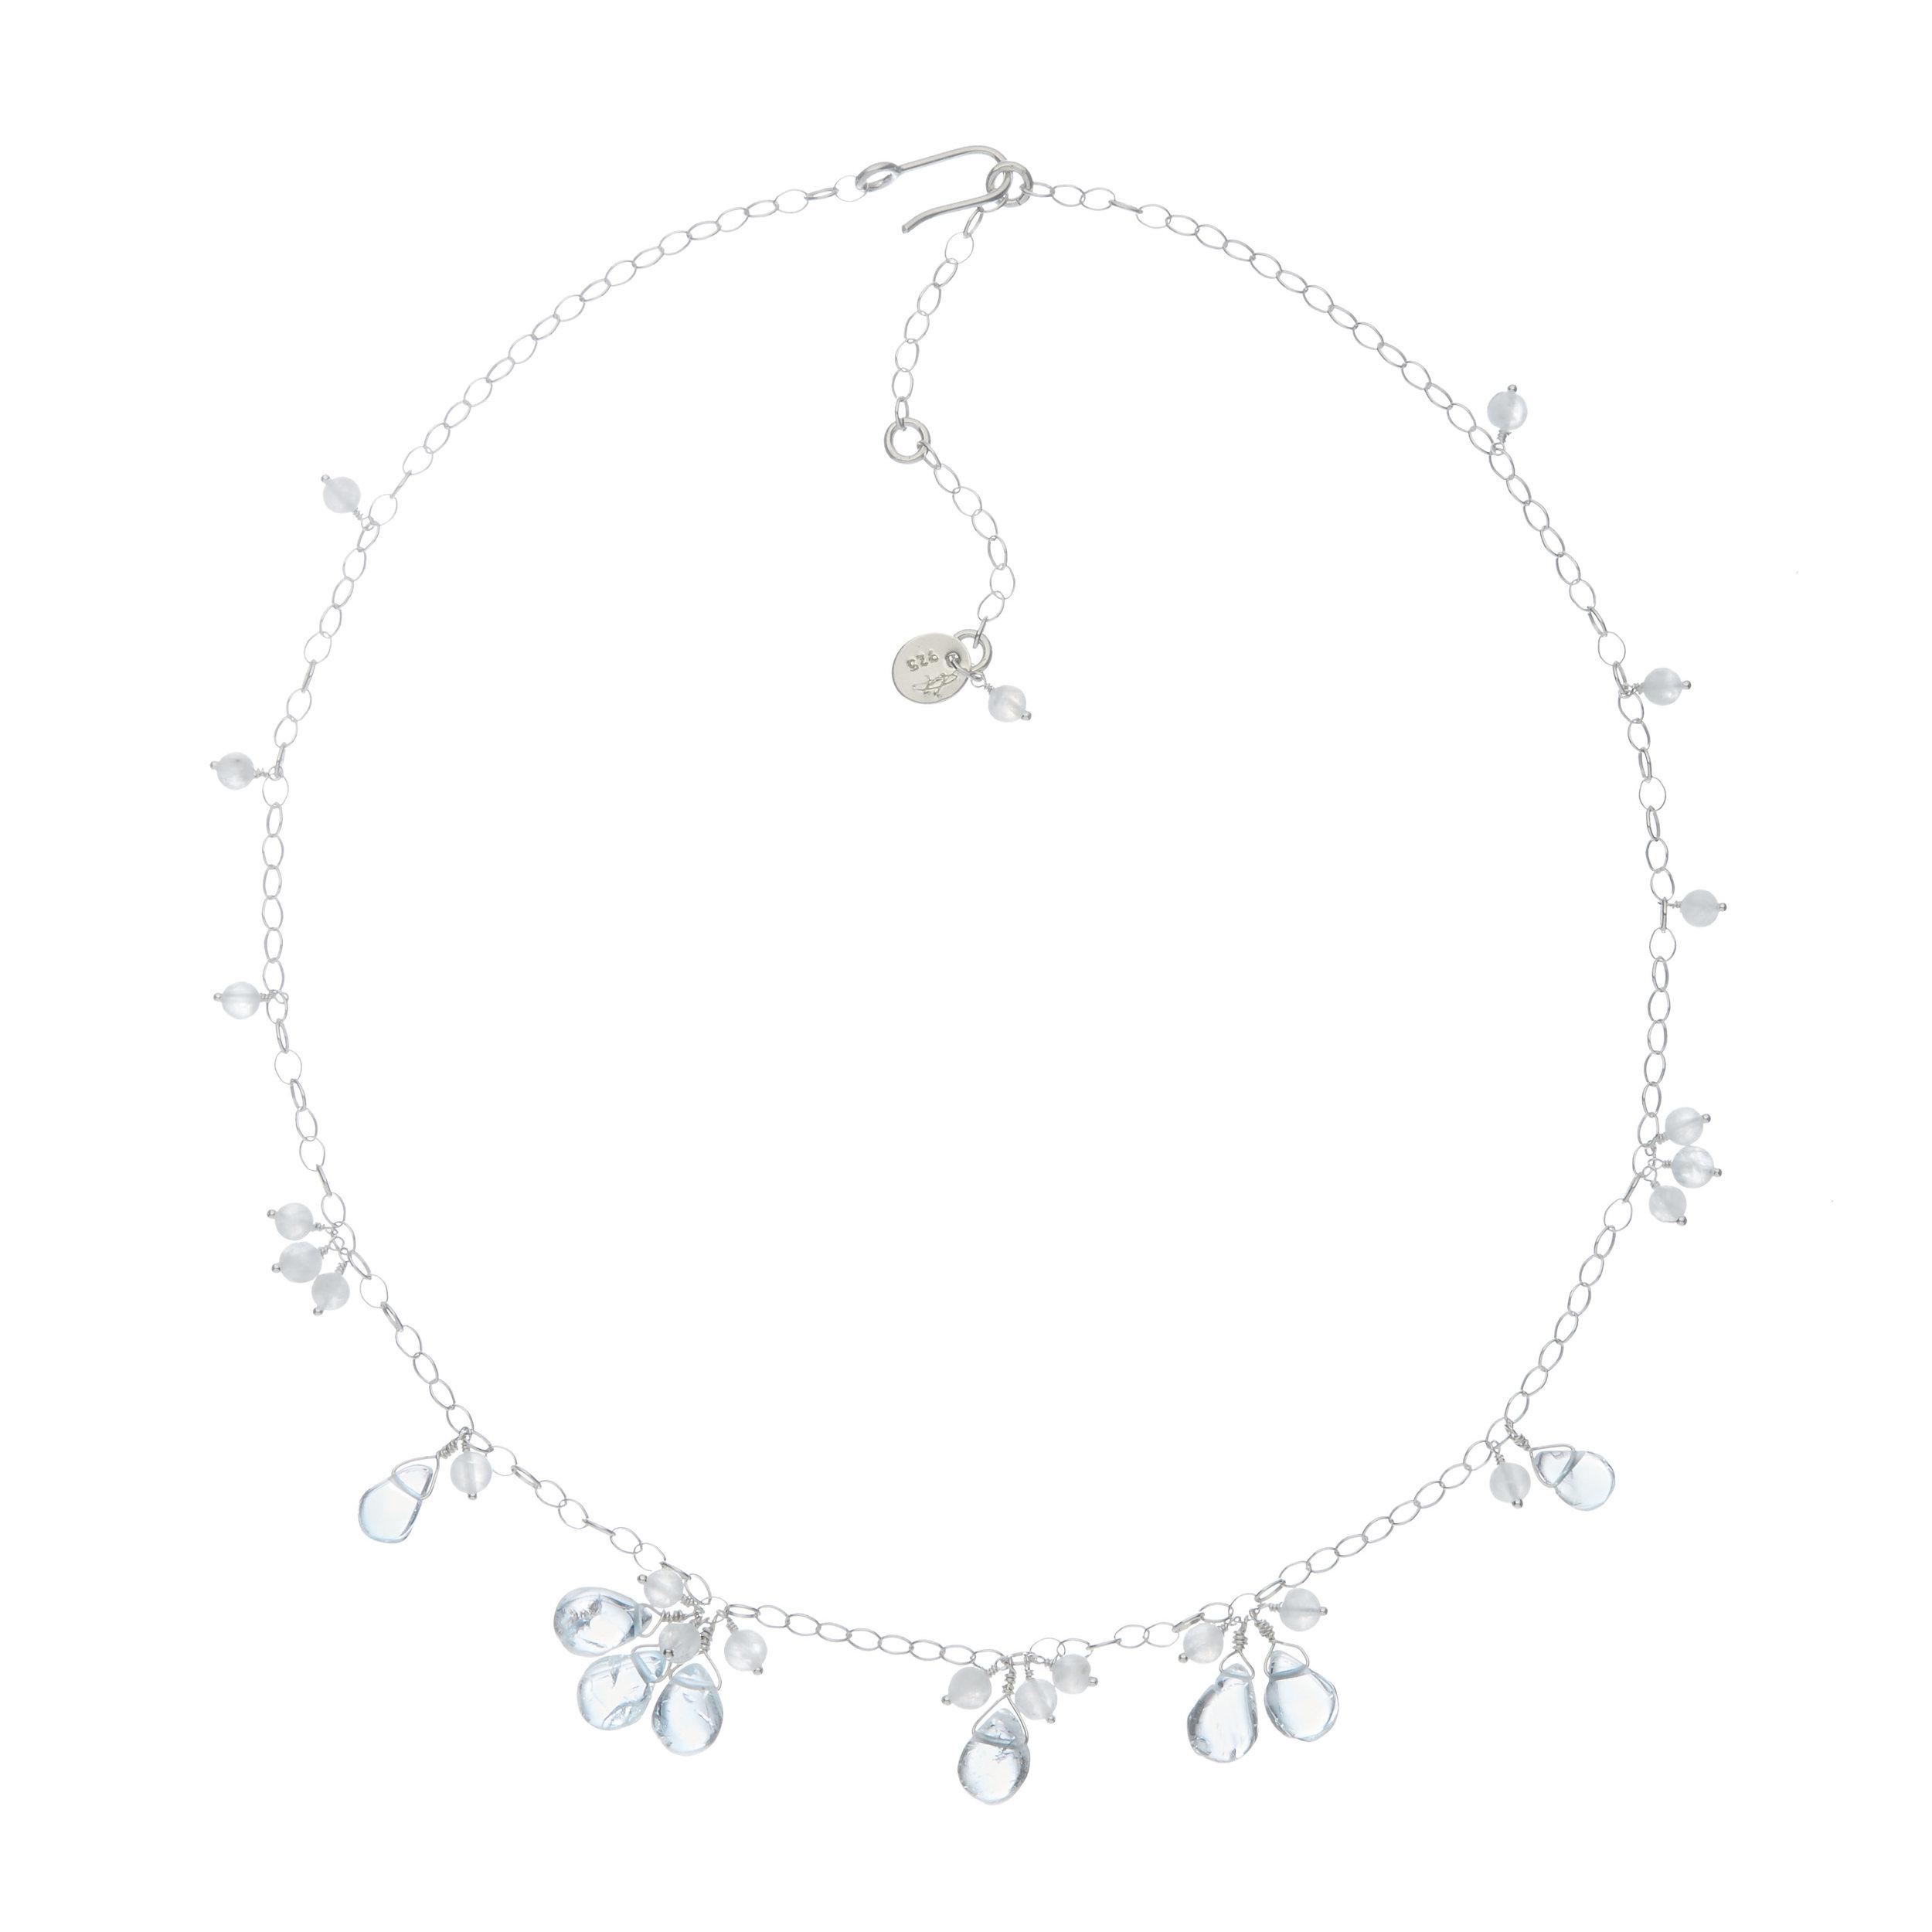 Kailani necklace